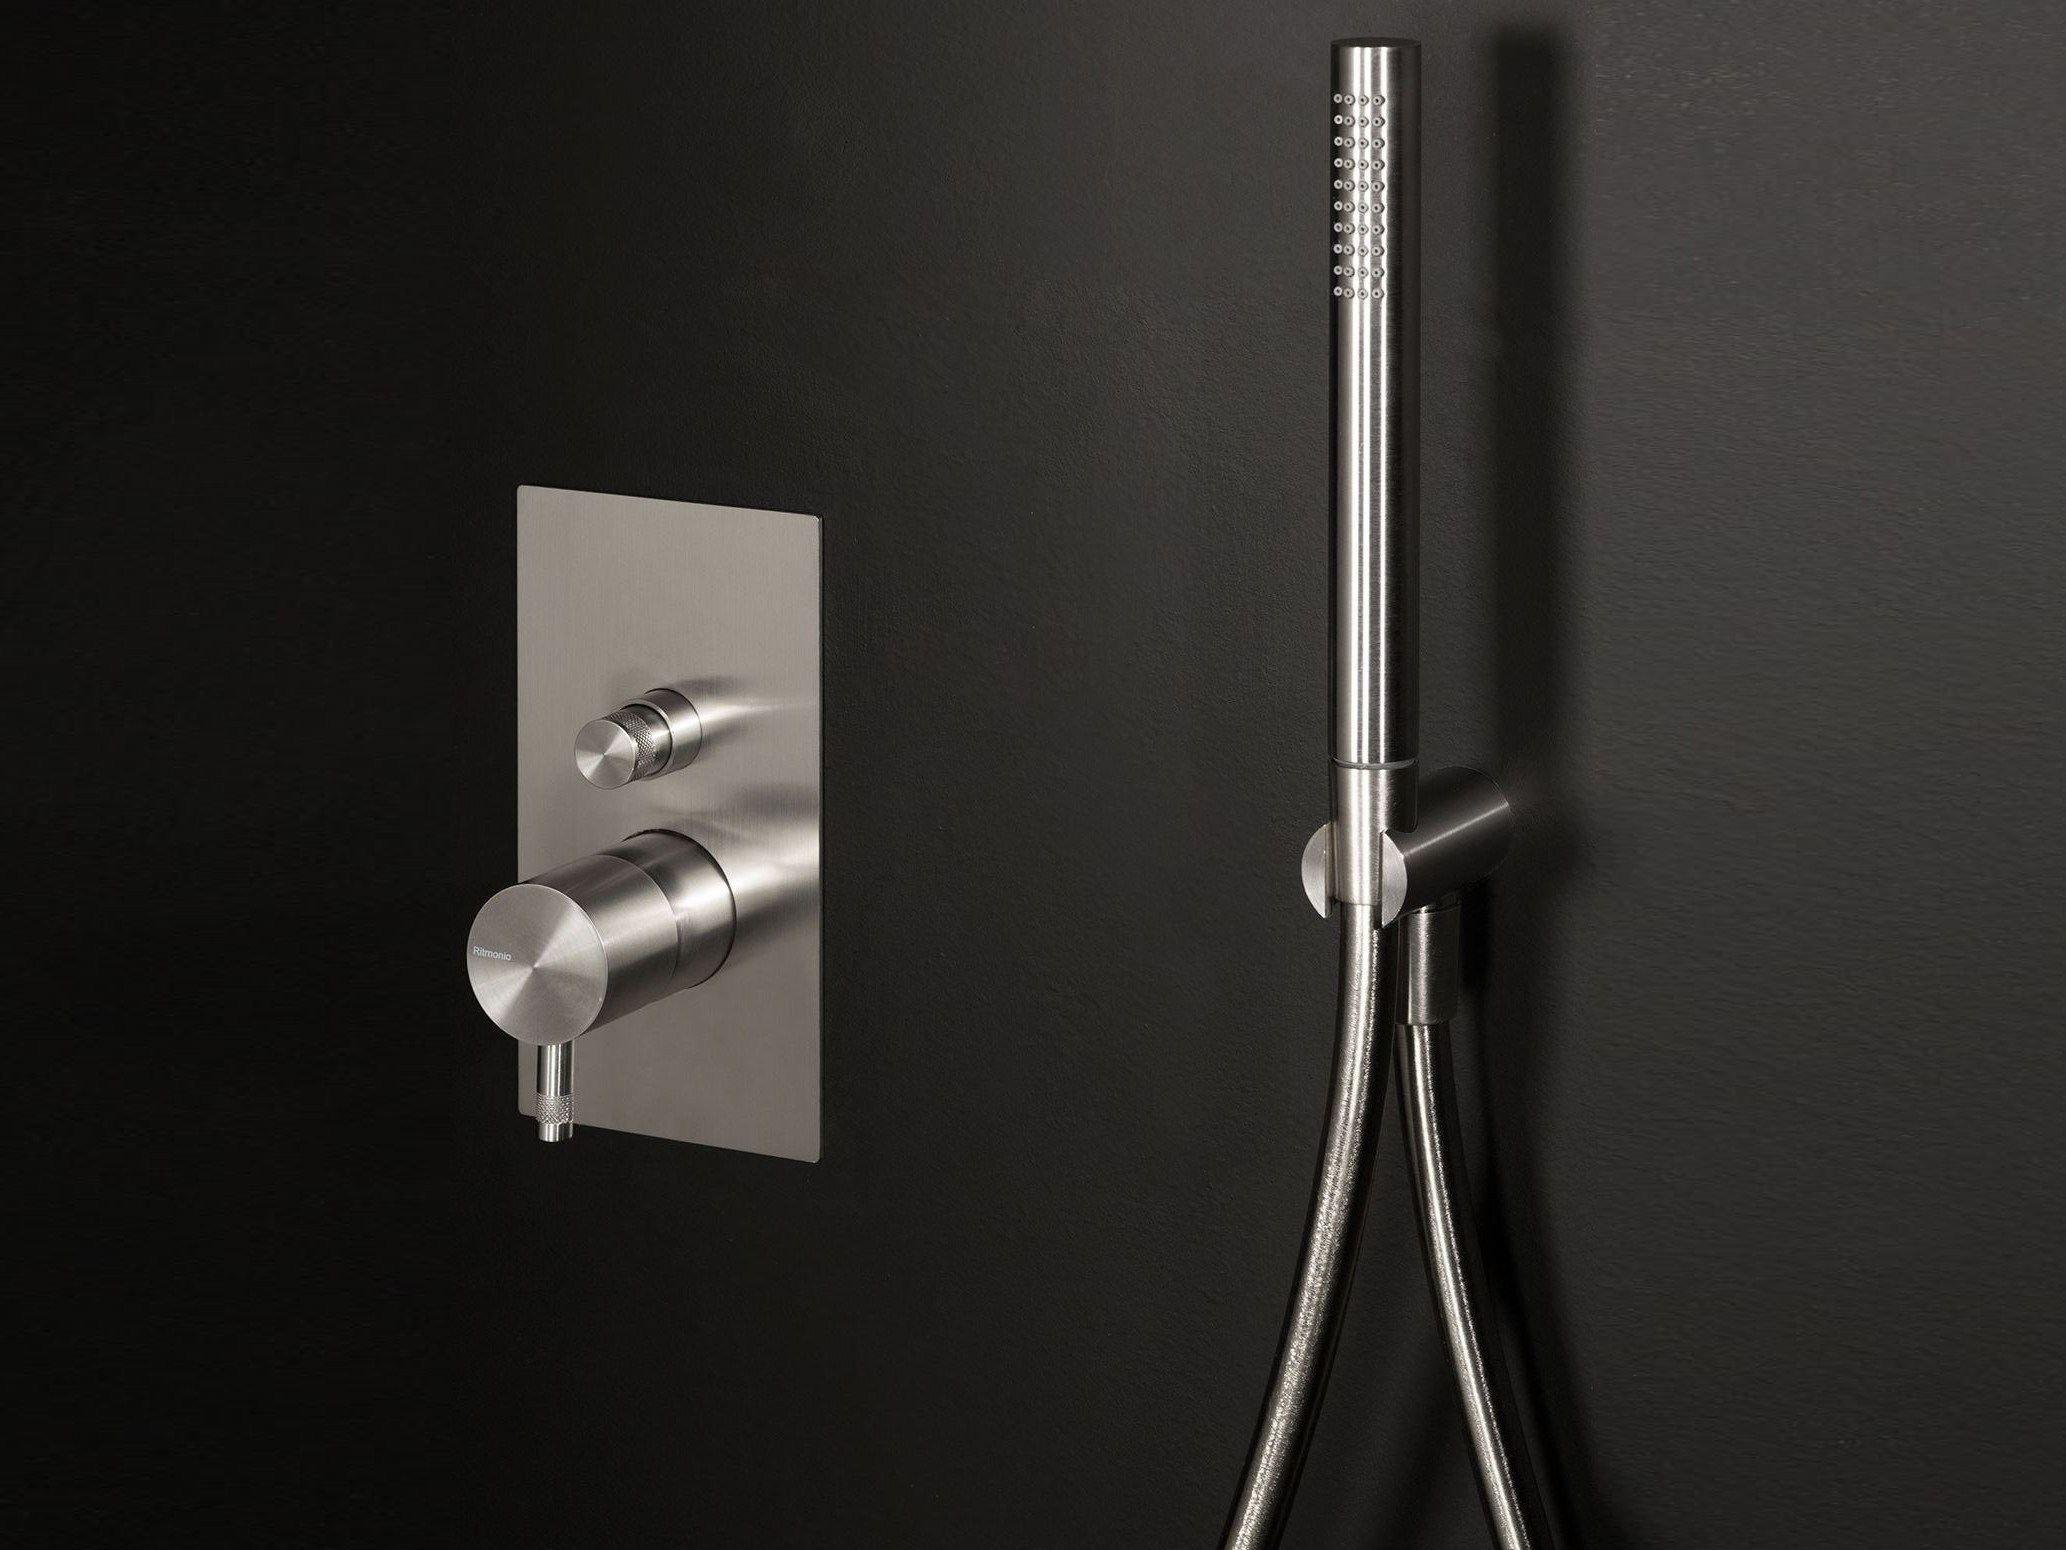 Diametro35 Inox Shower Mixer With Diverter By Rubinetterie